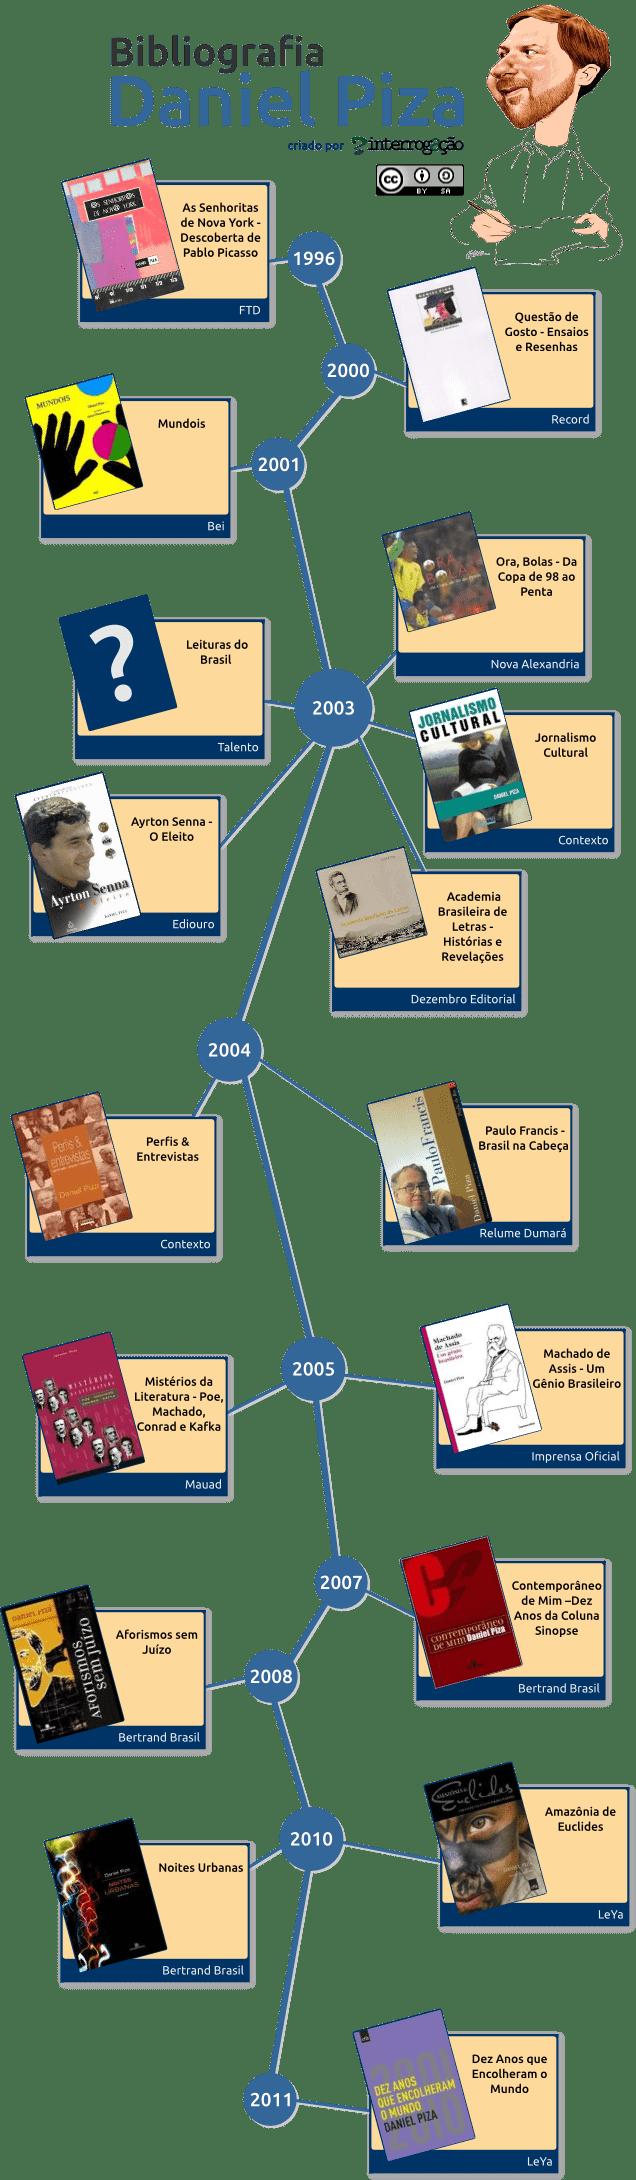 danielpiza-bibliografia